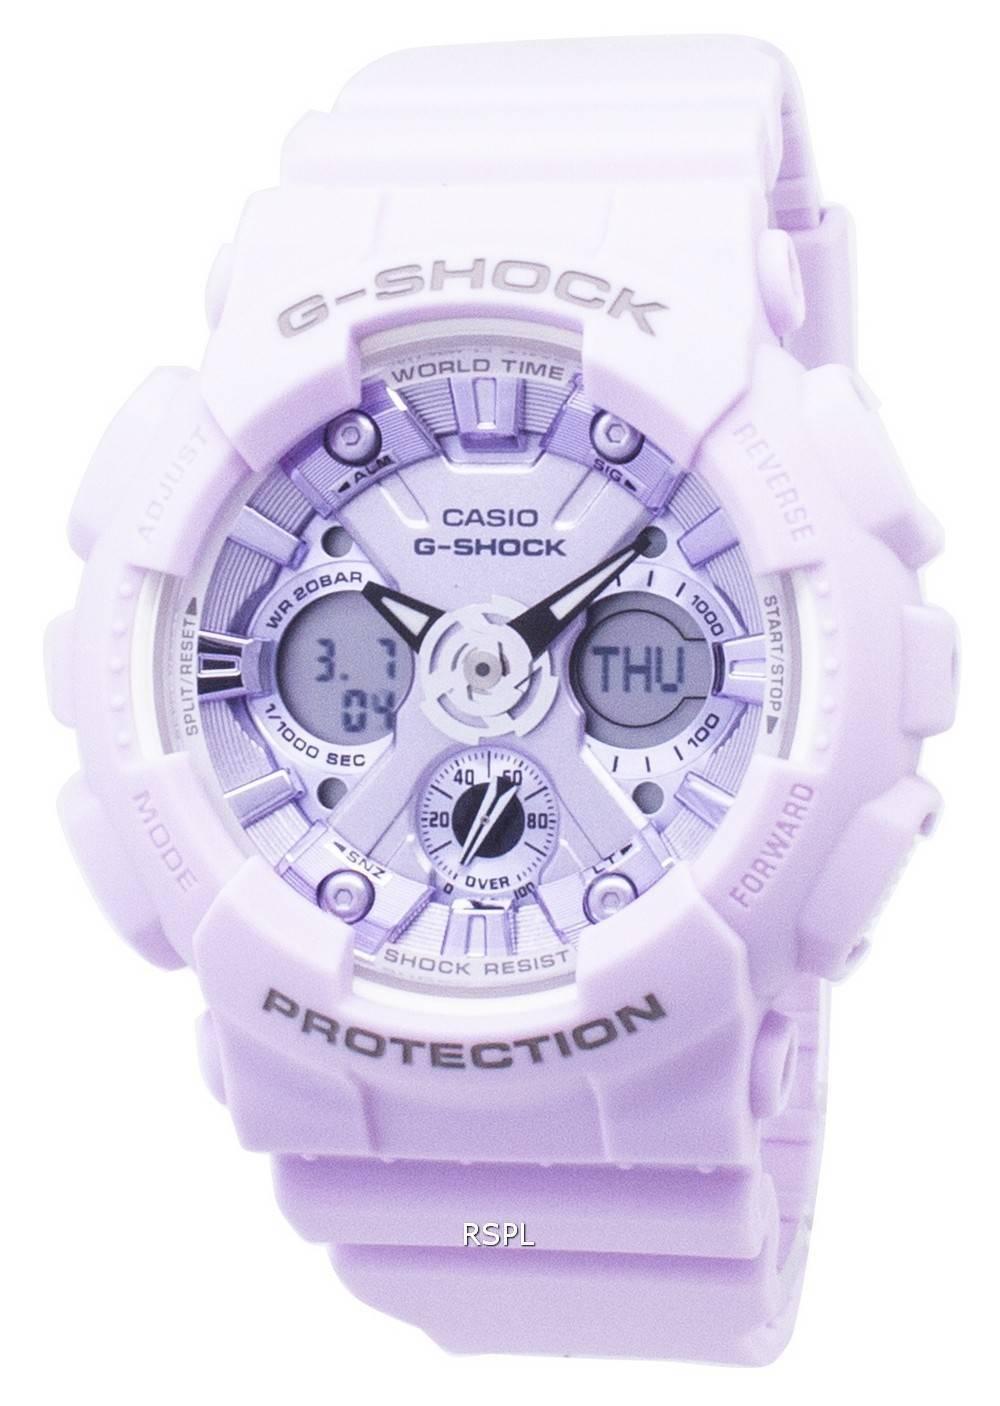 b7eda970605 Casio G-Shock GMA-S120DP-6A GMAS120DP-6A Analog Digital 200M Men s ...